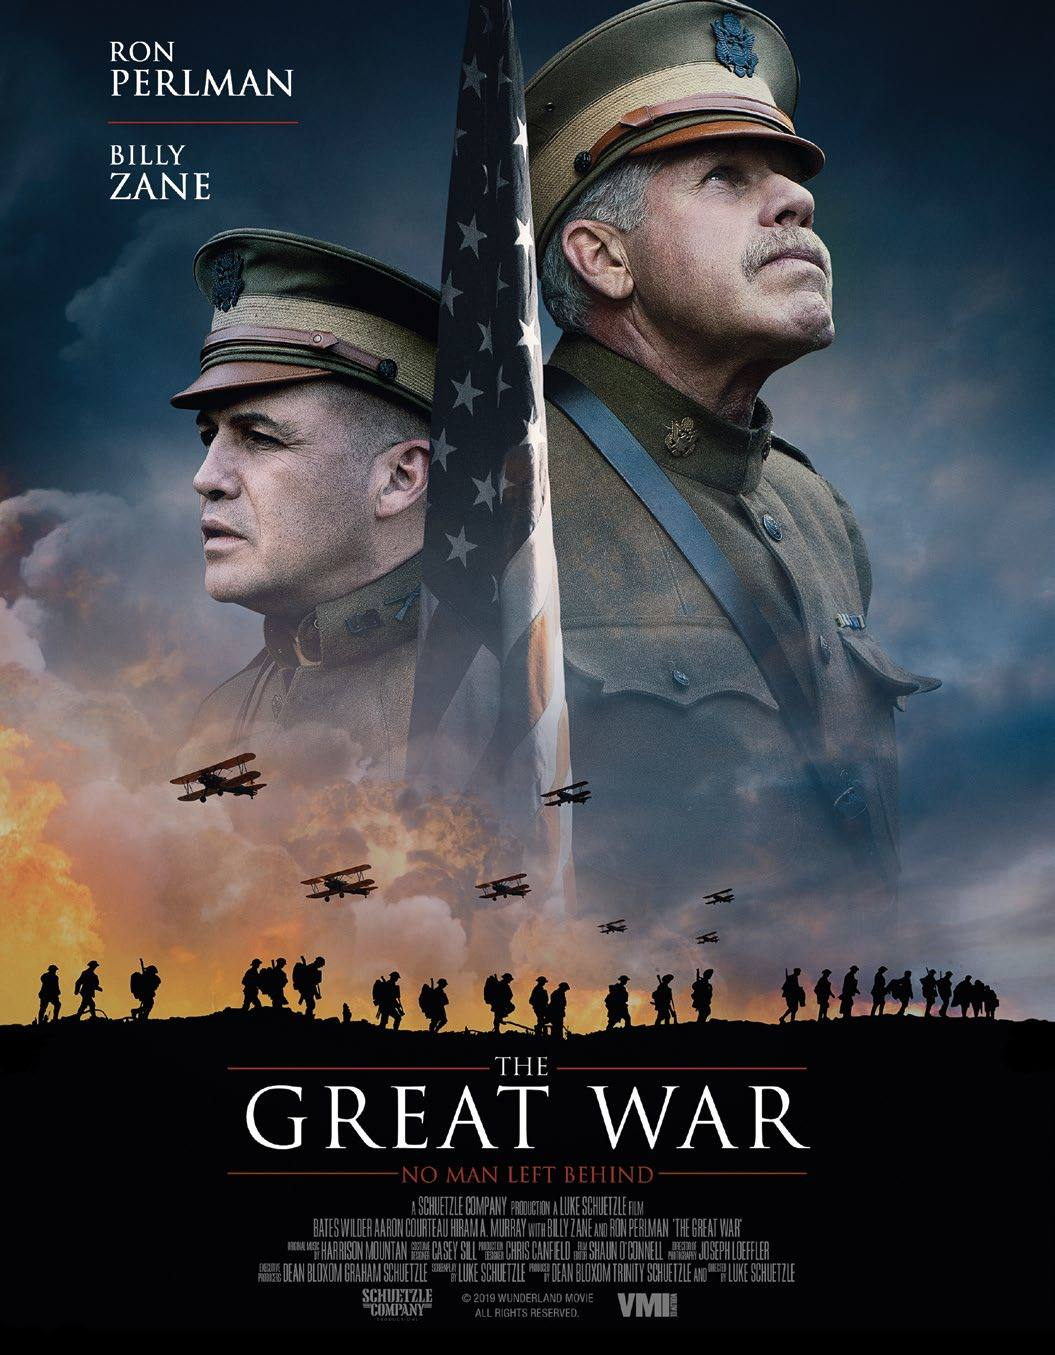 war great movie poster teaser trailer company 1080p soldiers h264 fgt dd5 dl web film enemy behind ddlvalley warfare junkie